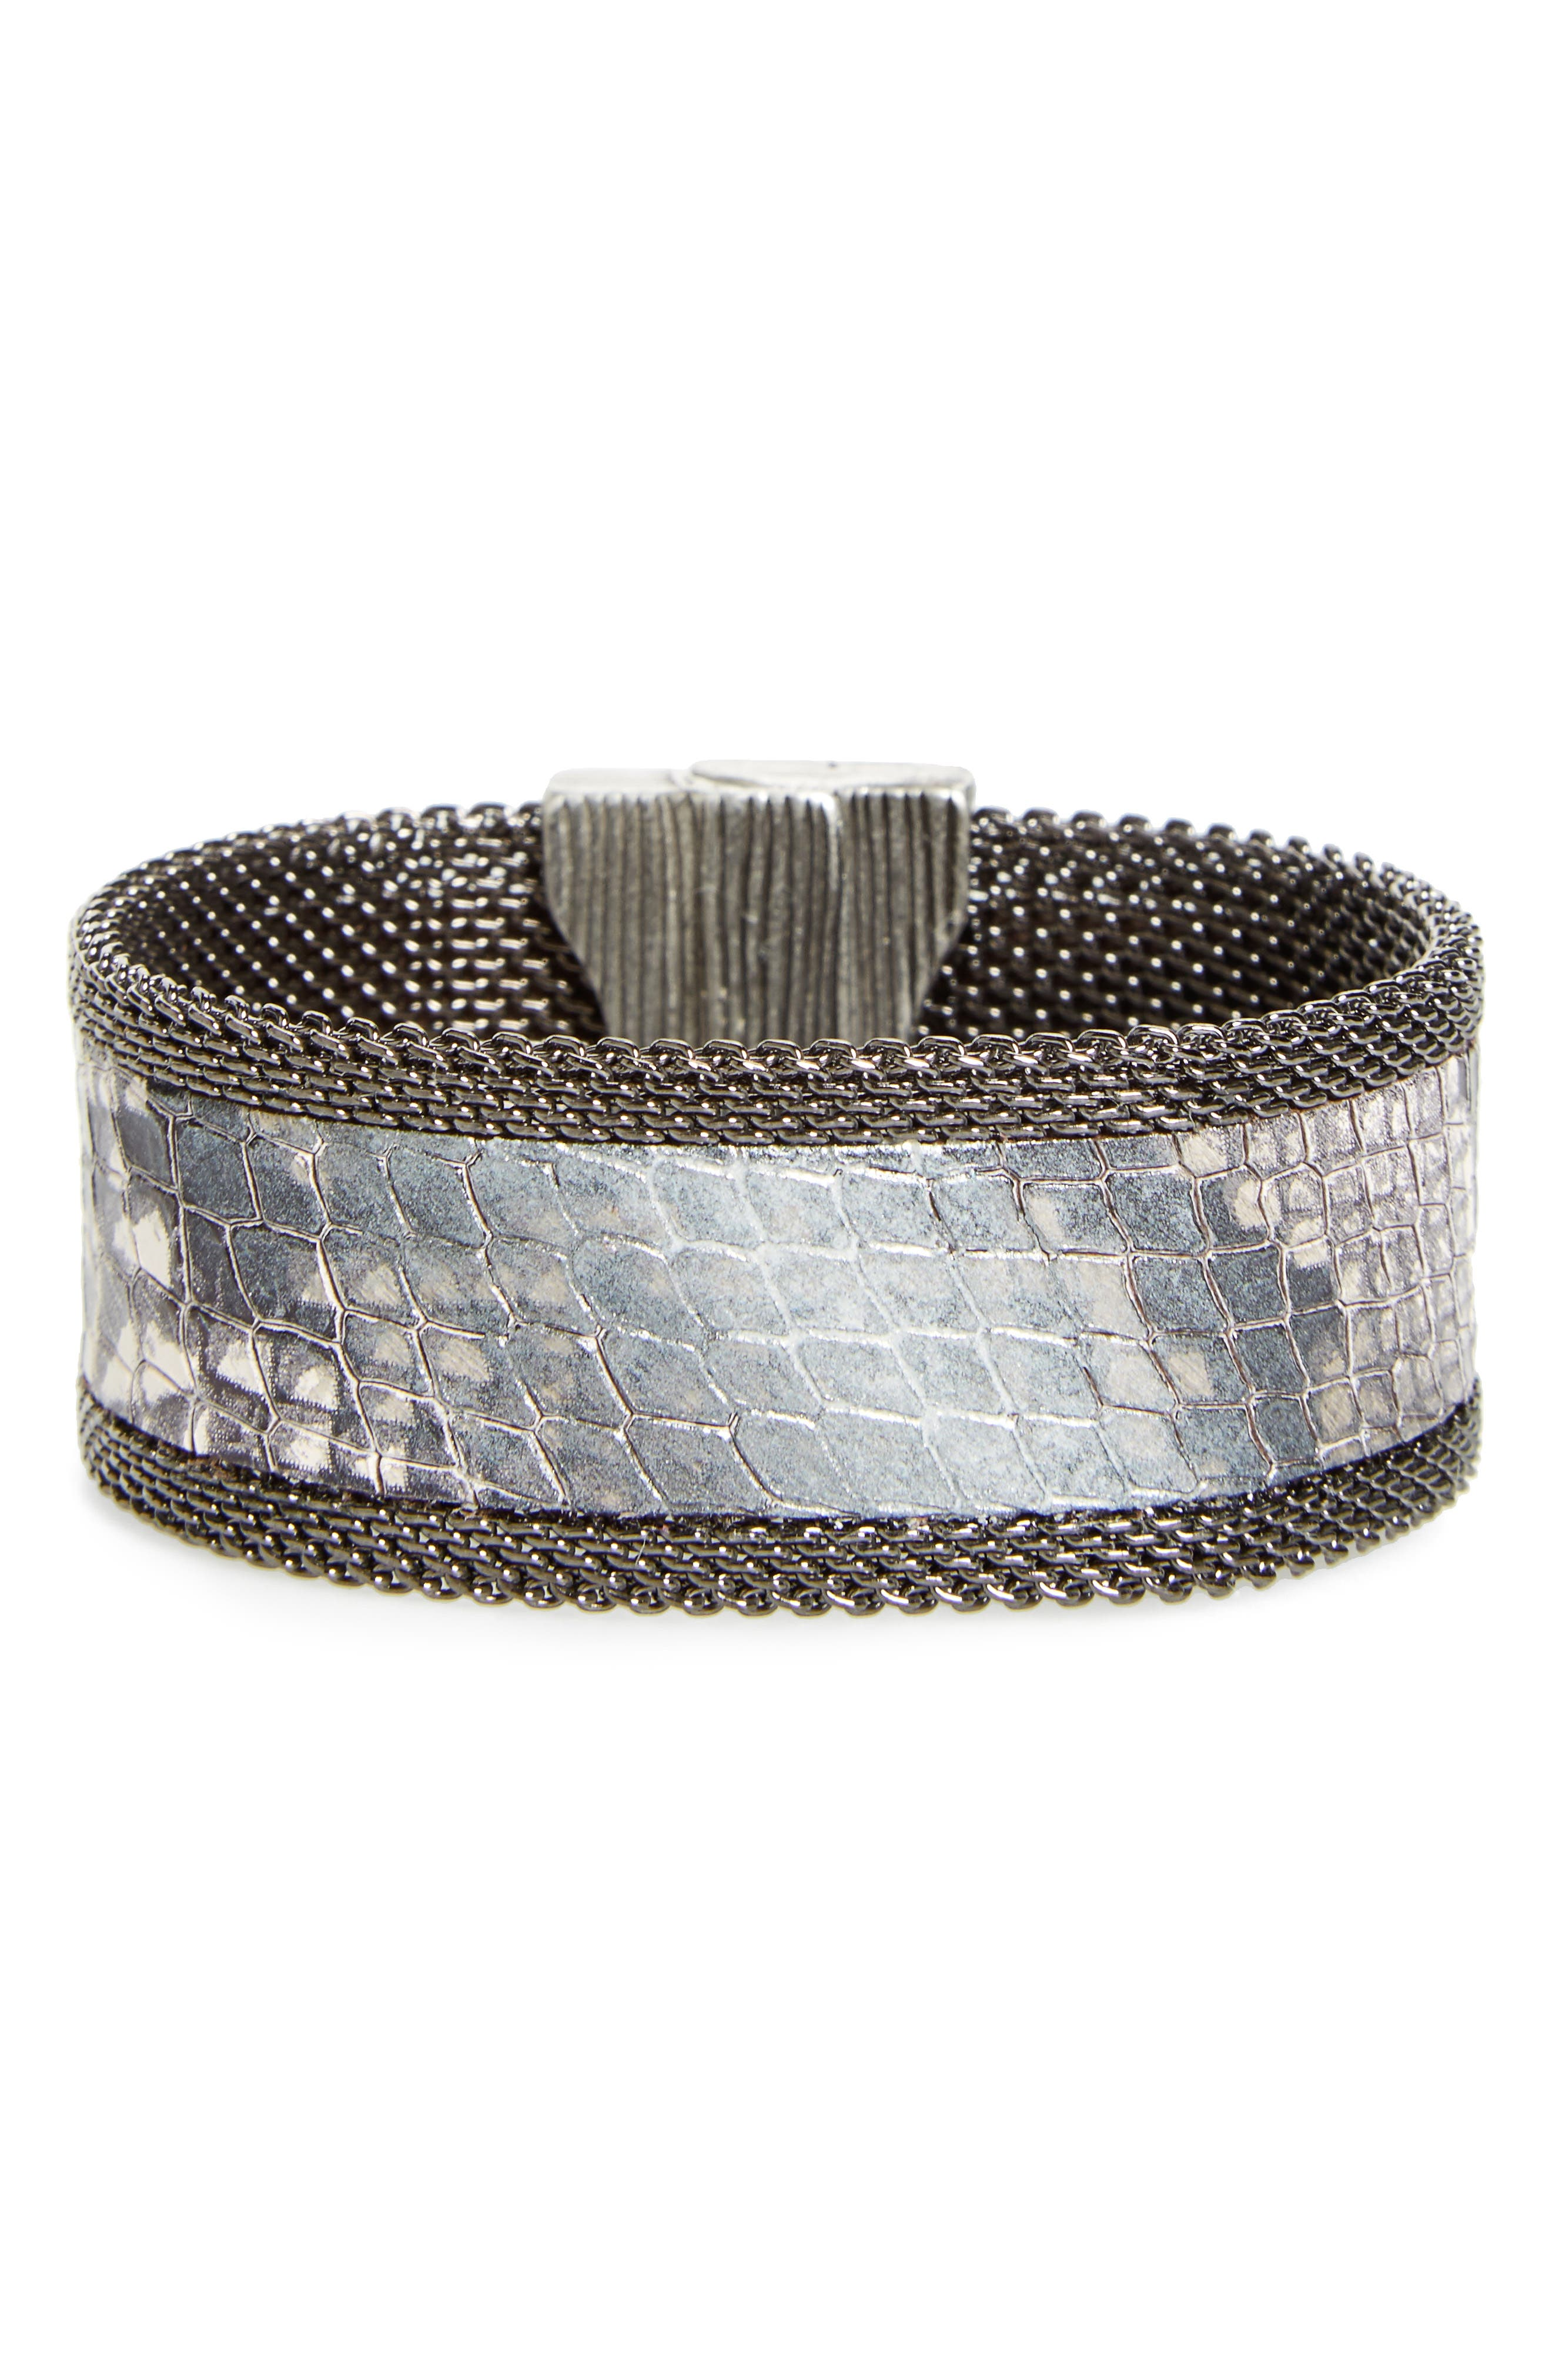 Main Image - Cynthia Desser Genuine Snakeskin Cuff